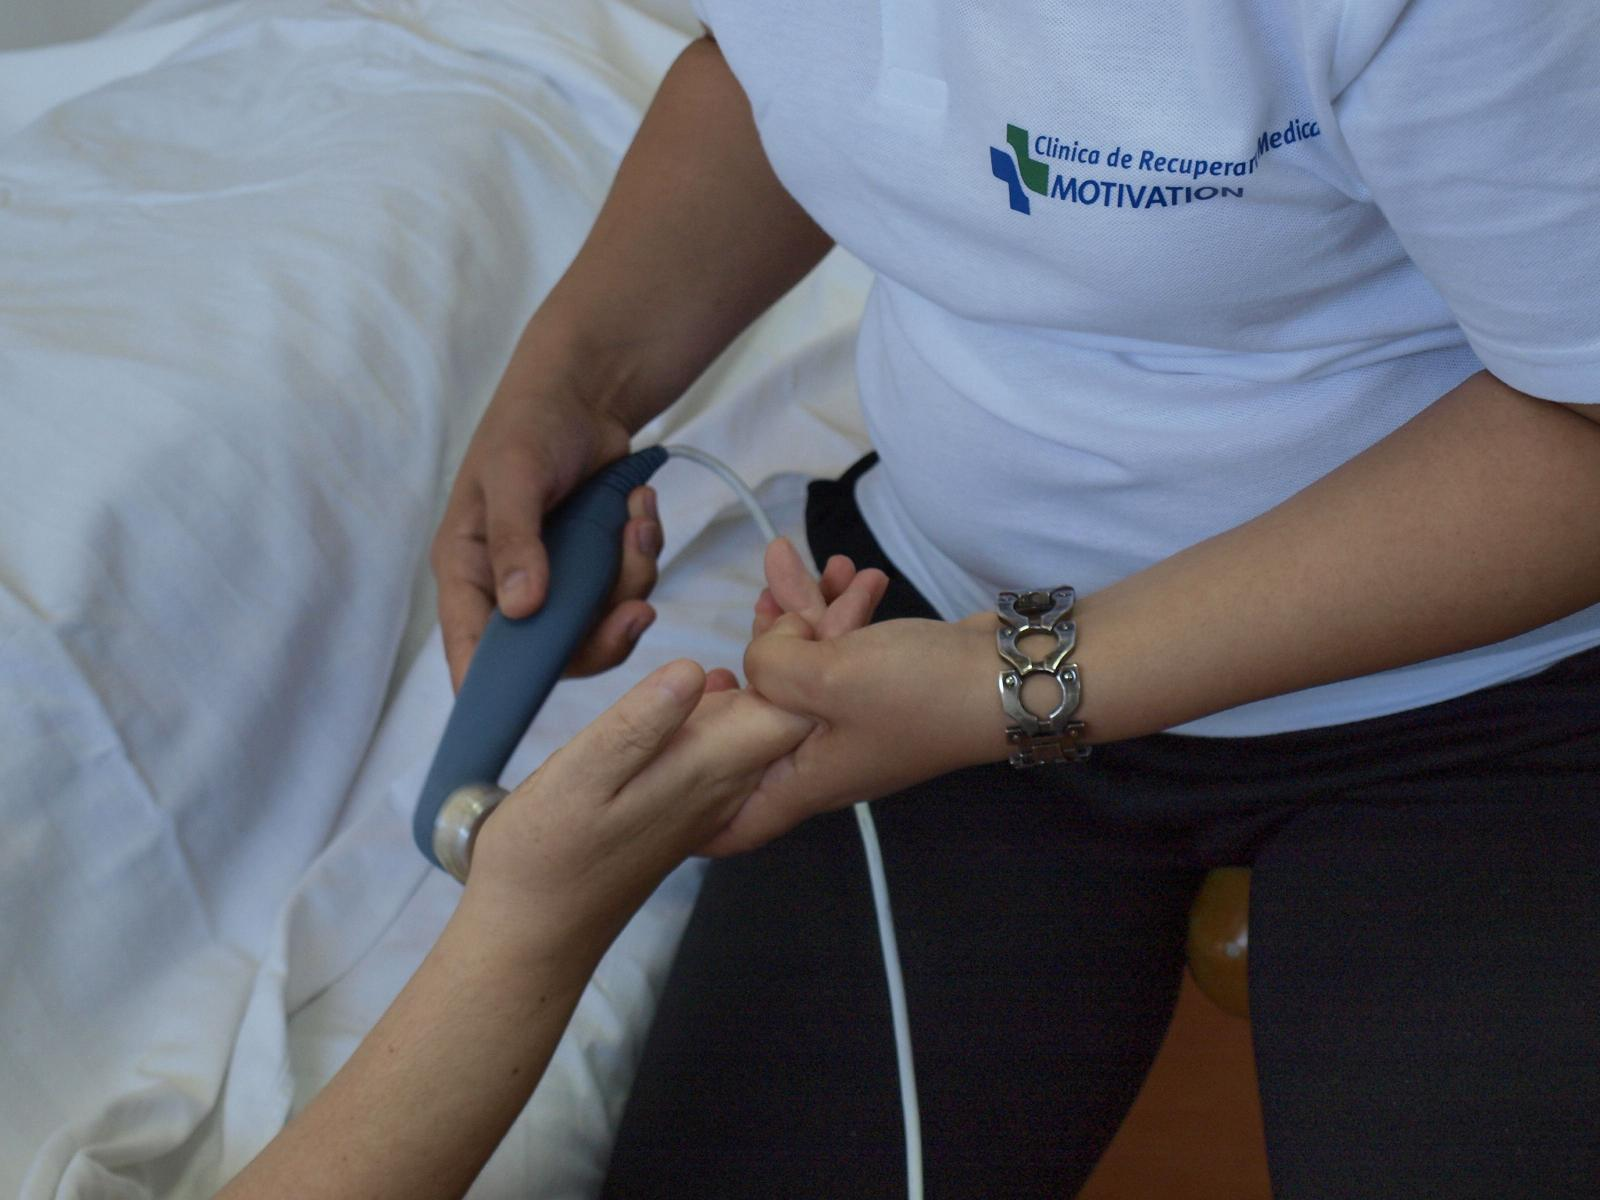 Clinica de Recuperare Motivation - _5132634.JPG